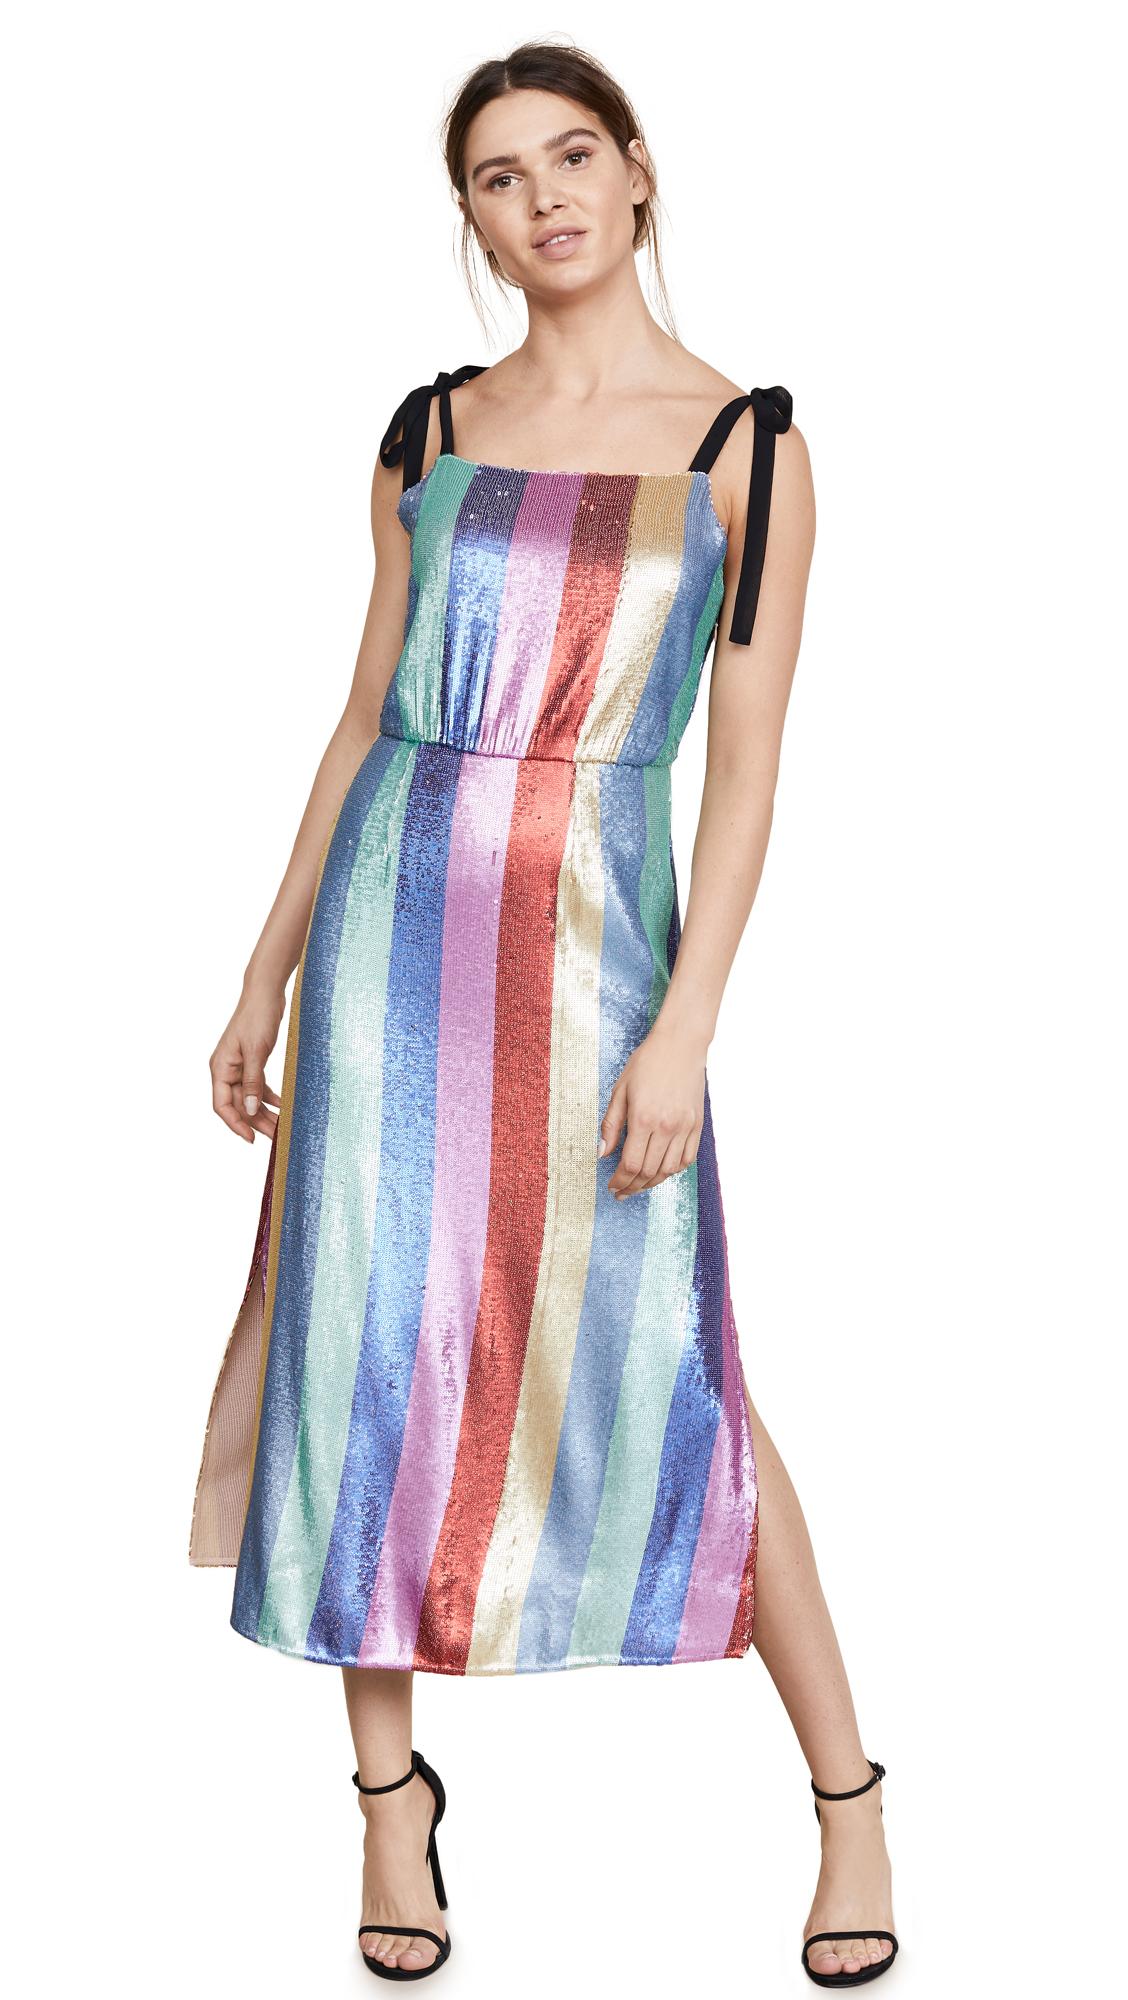 RIXO London Tessa Sequin Dress